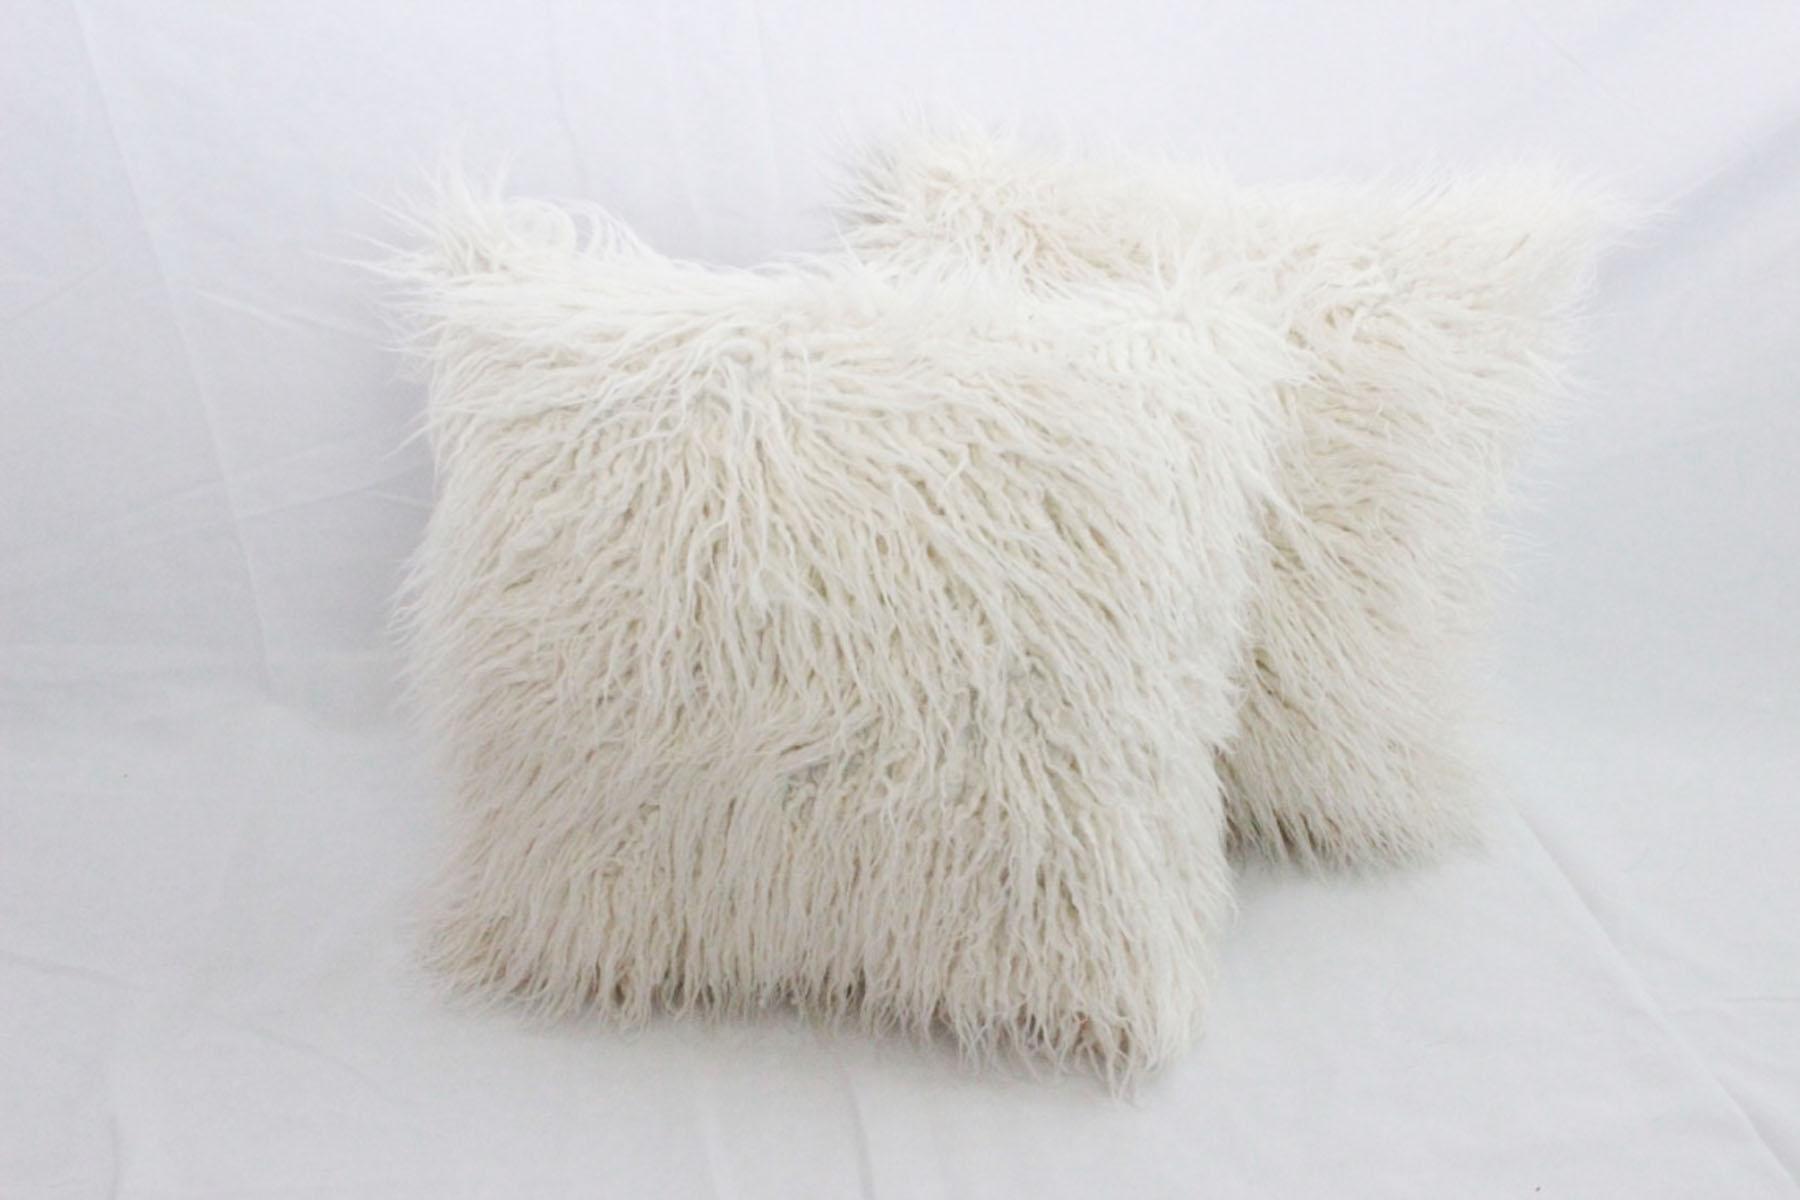 Mongolia Pillows - Scavenged Vintage